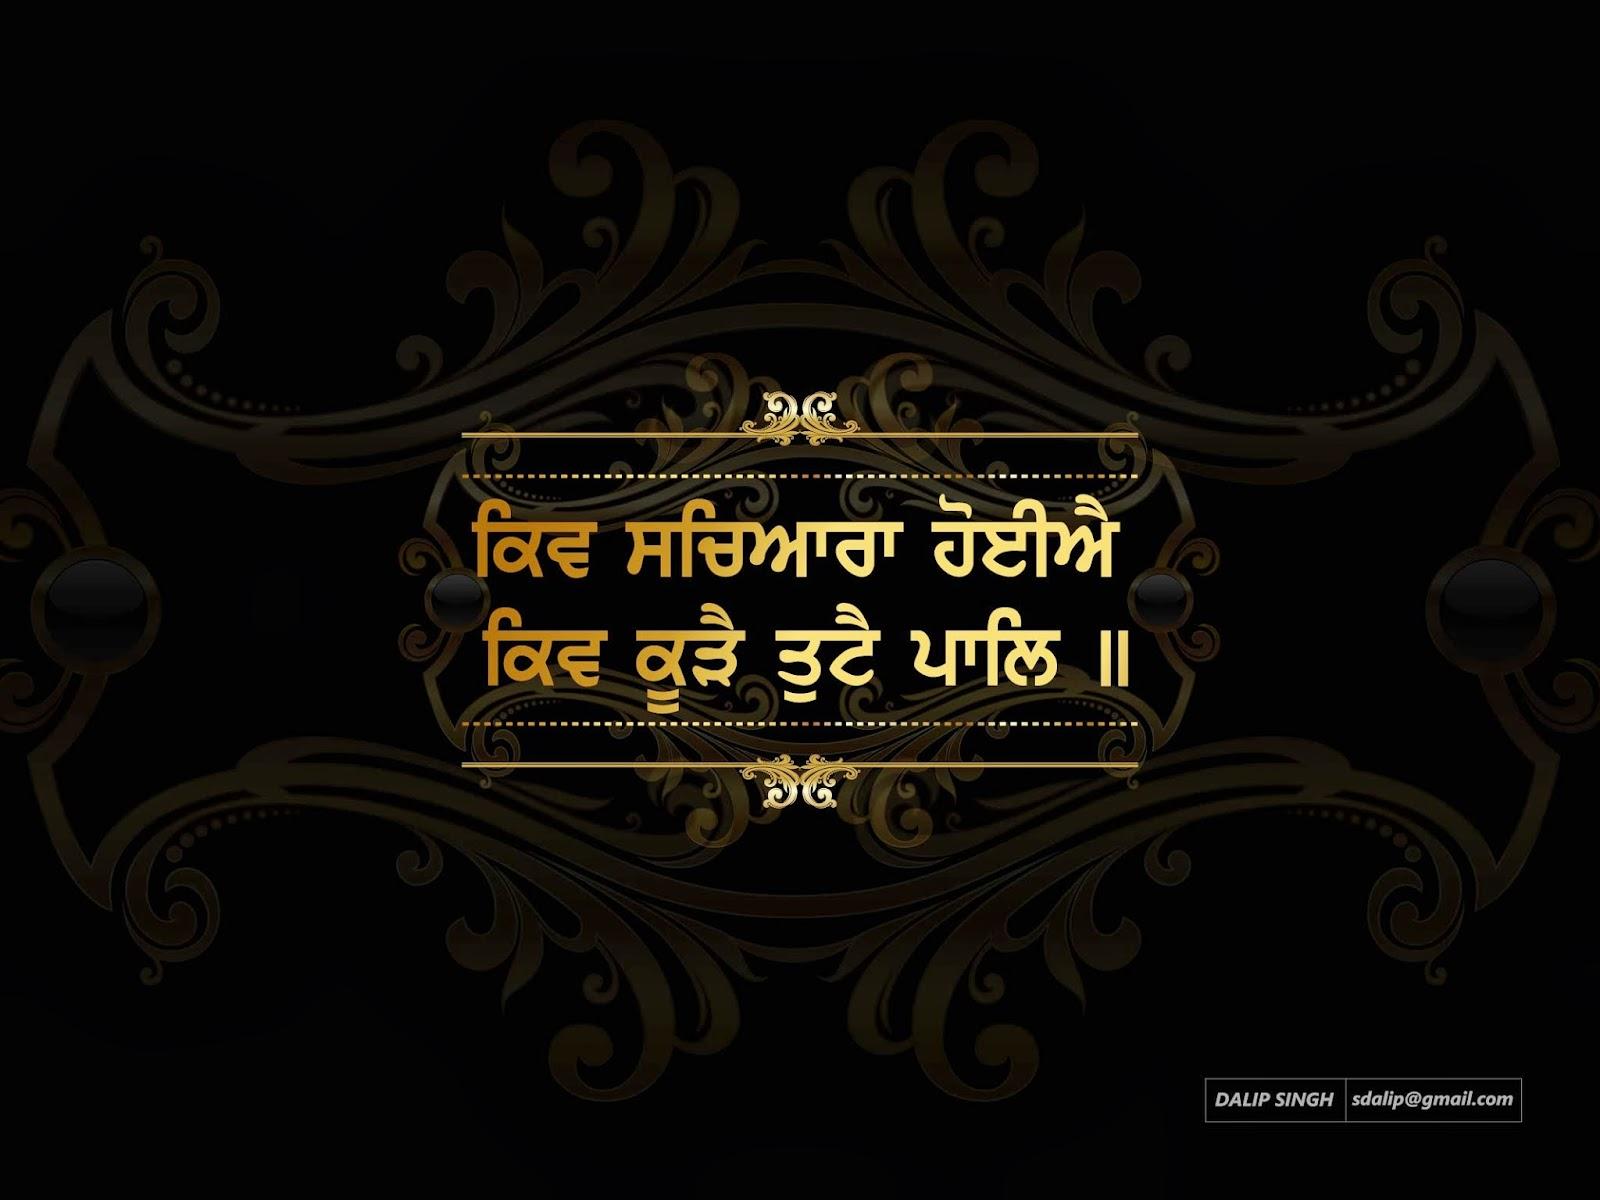 sikhi wallpaper